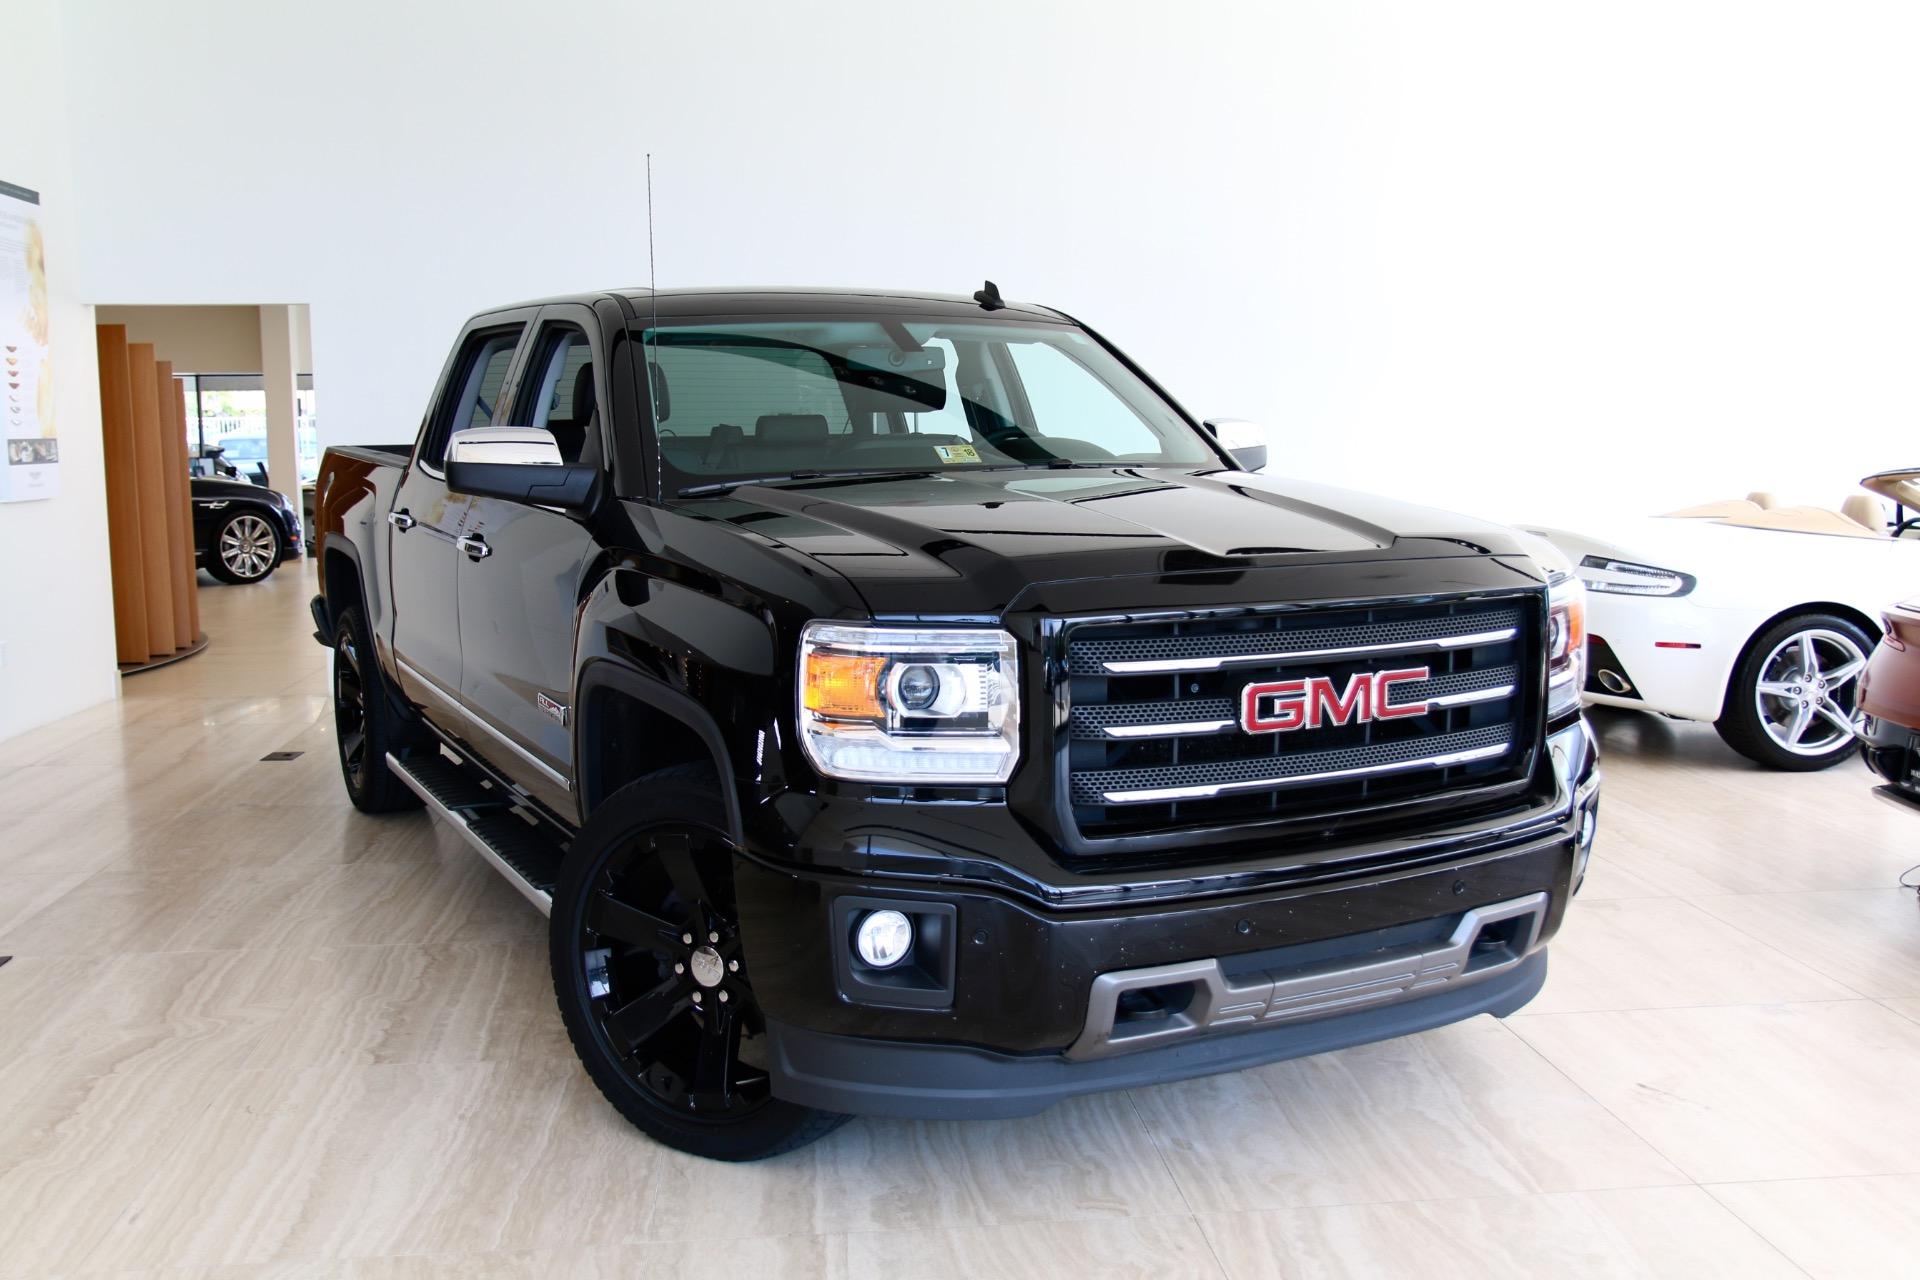 sales watch georgetown dealers sierra ky gmc used truck for cab auto sold reg sale kentucky